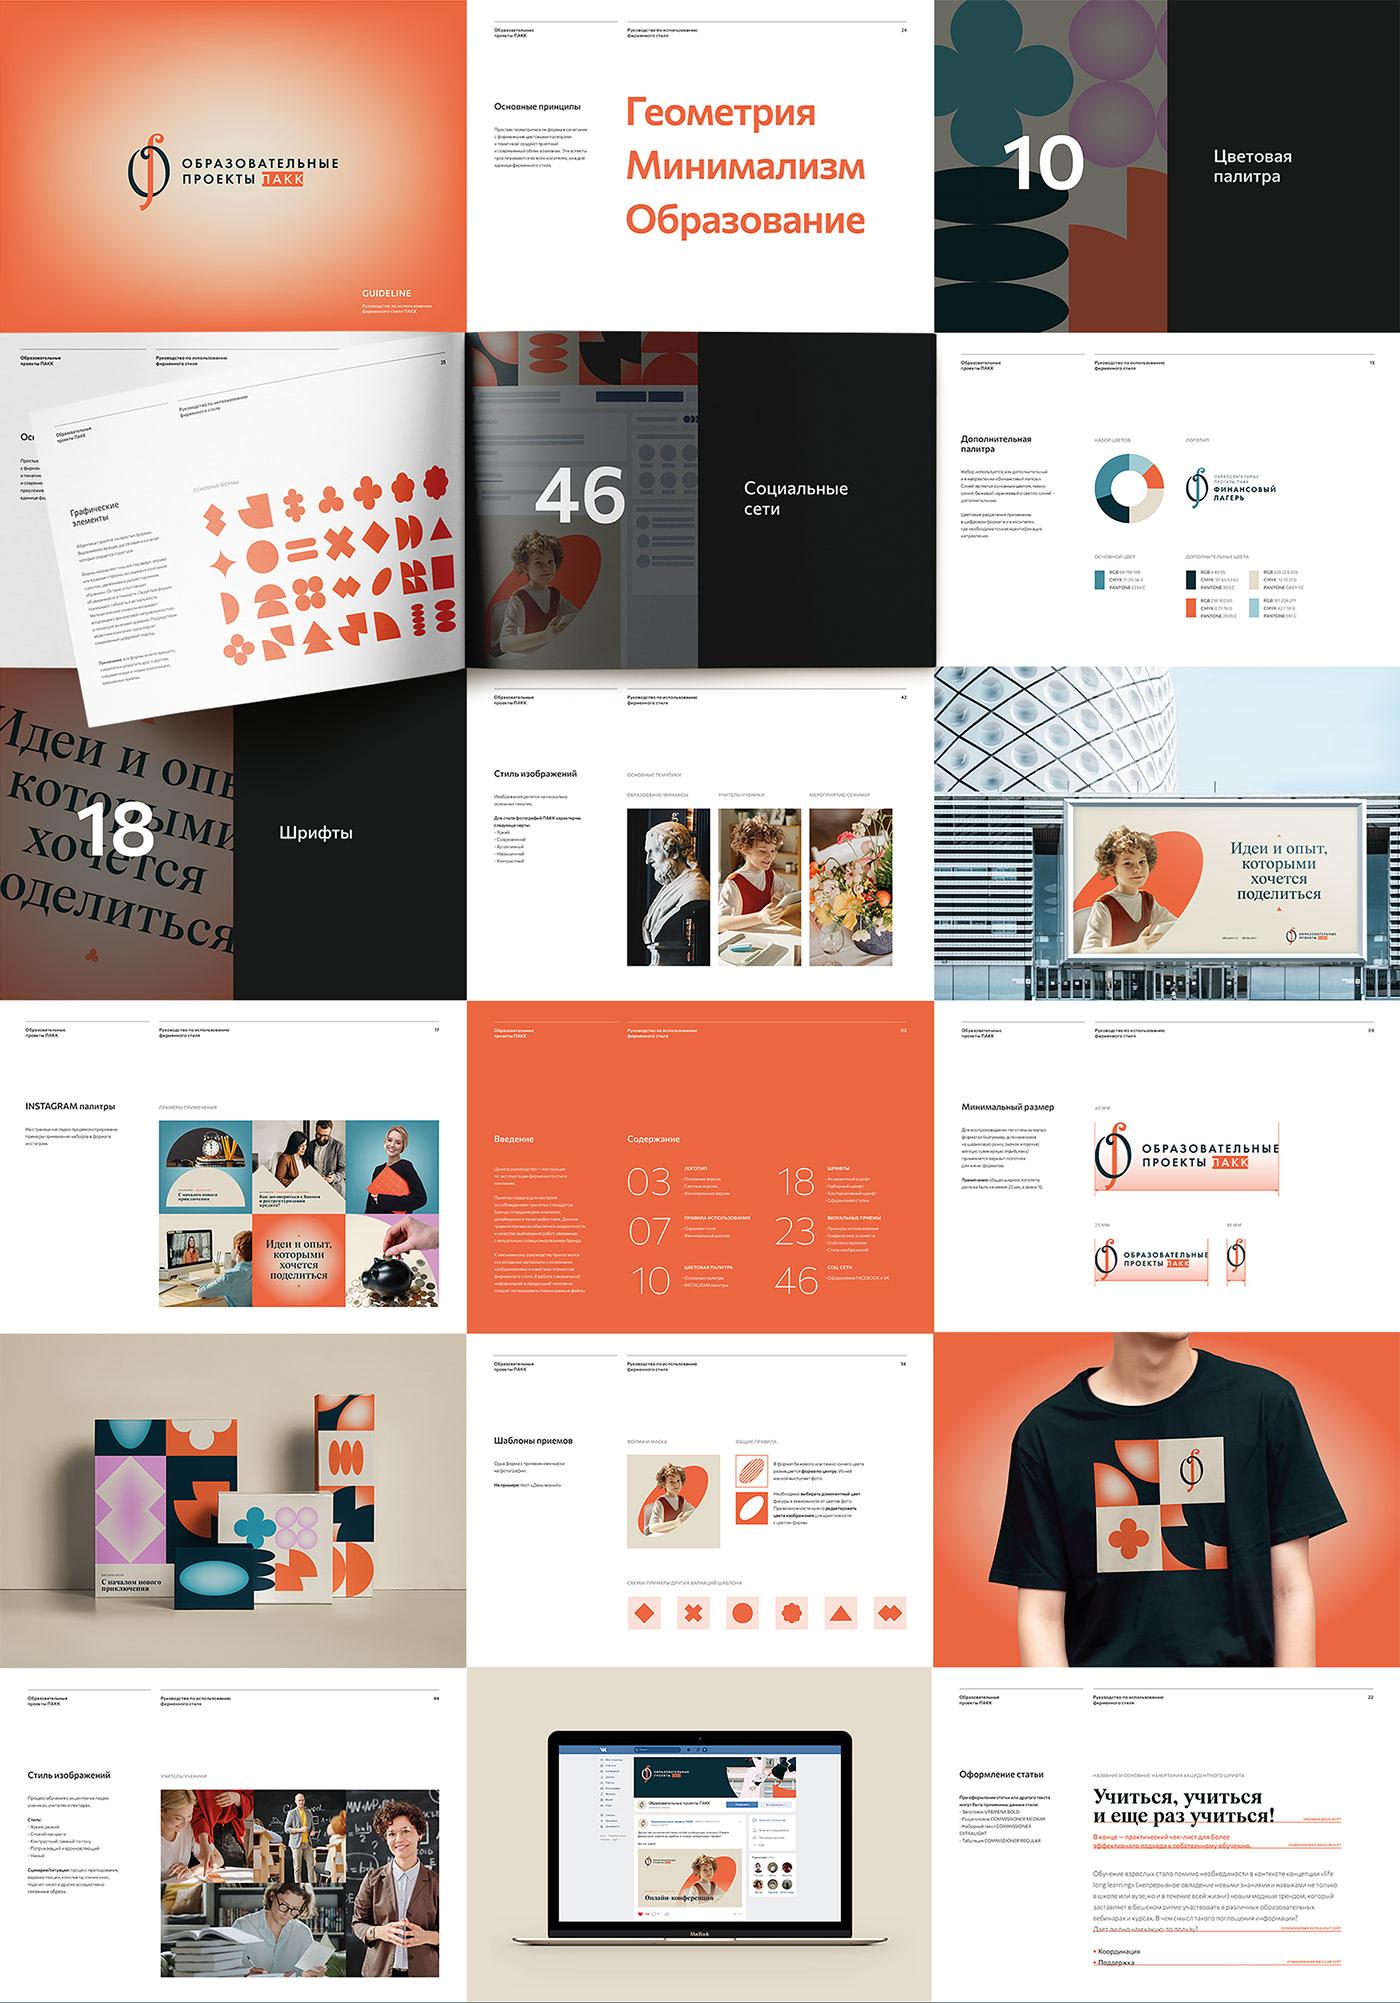 Education geometry guideline identity orange social media айдентика гайдлайн оранжевый социальные сети